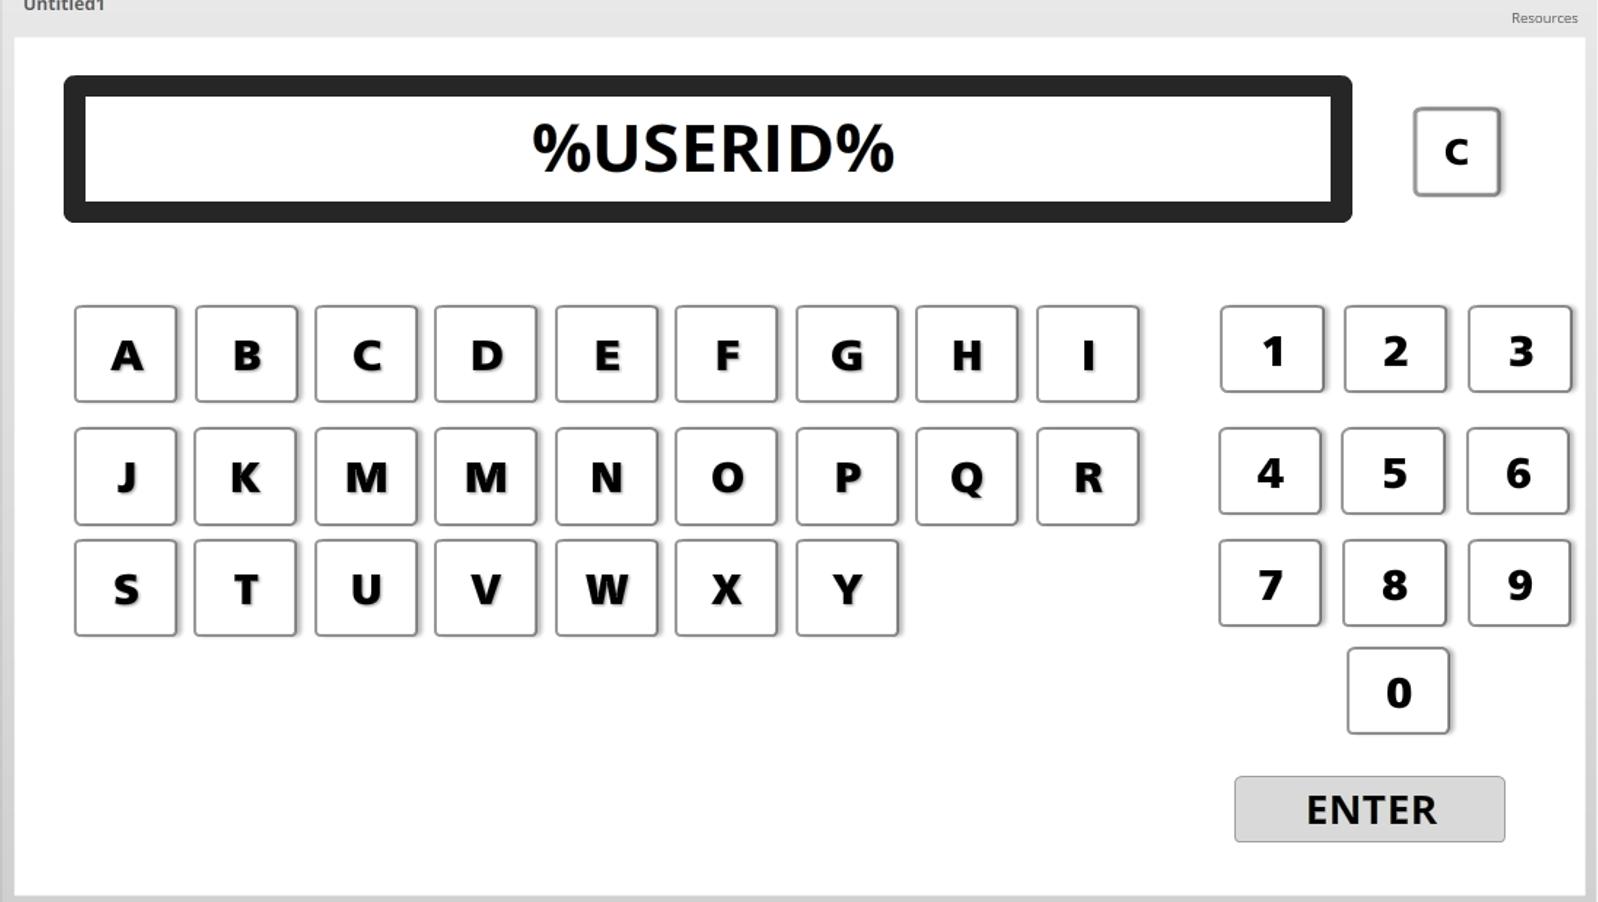 Data Entry Onscreen